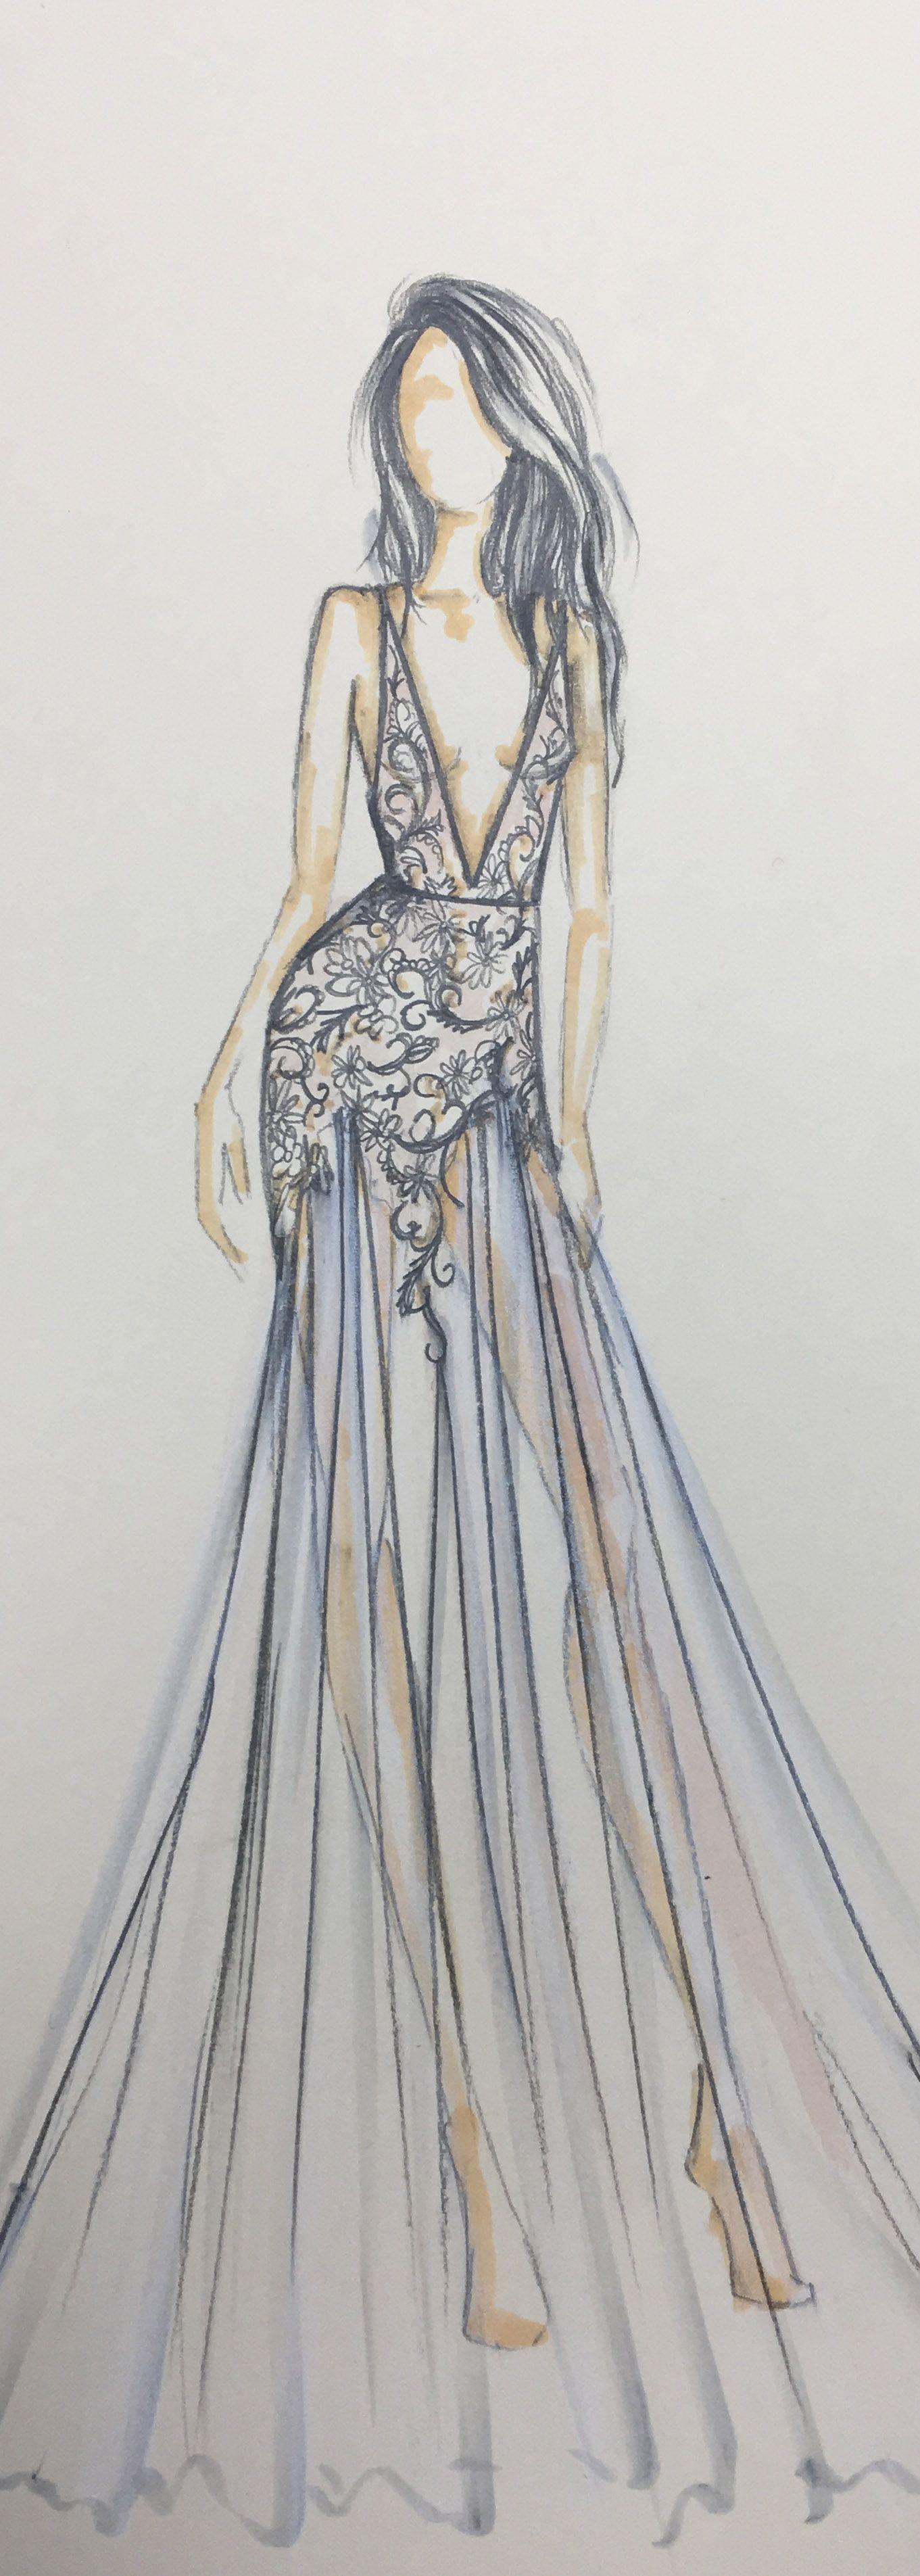 #BERTA 2017 sketch - style 17-136